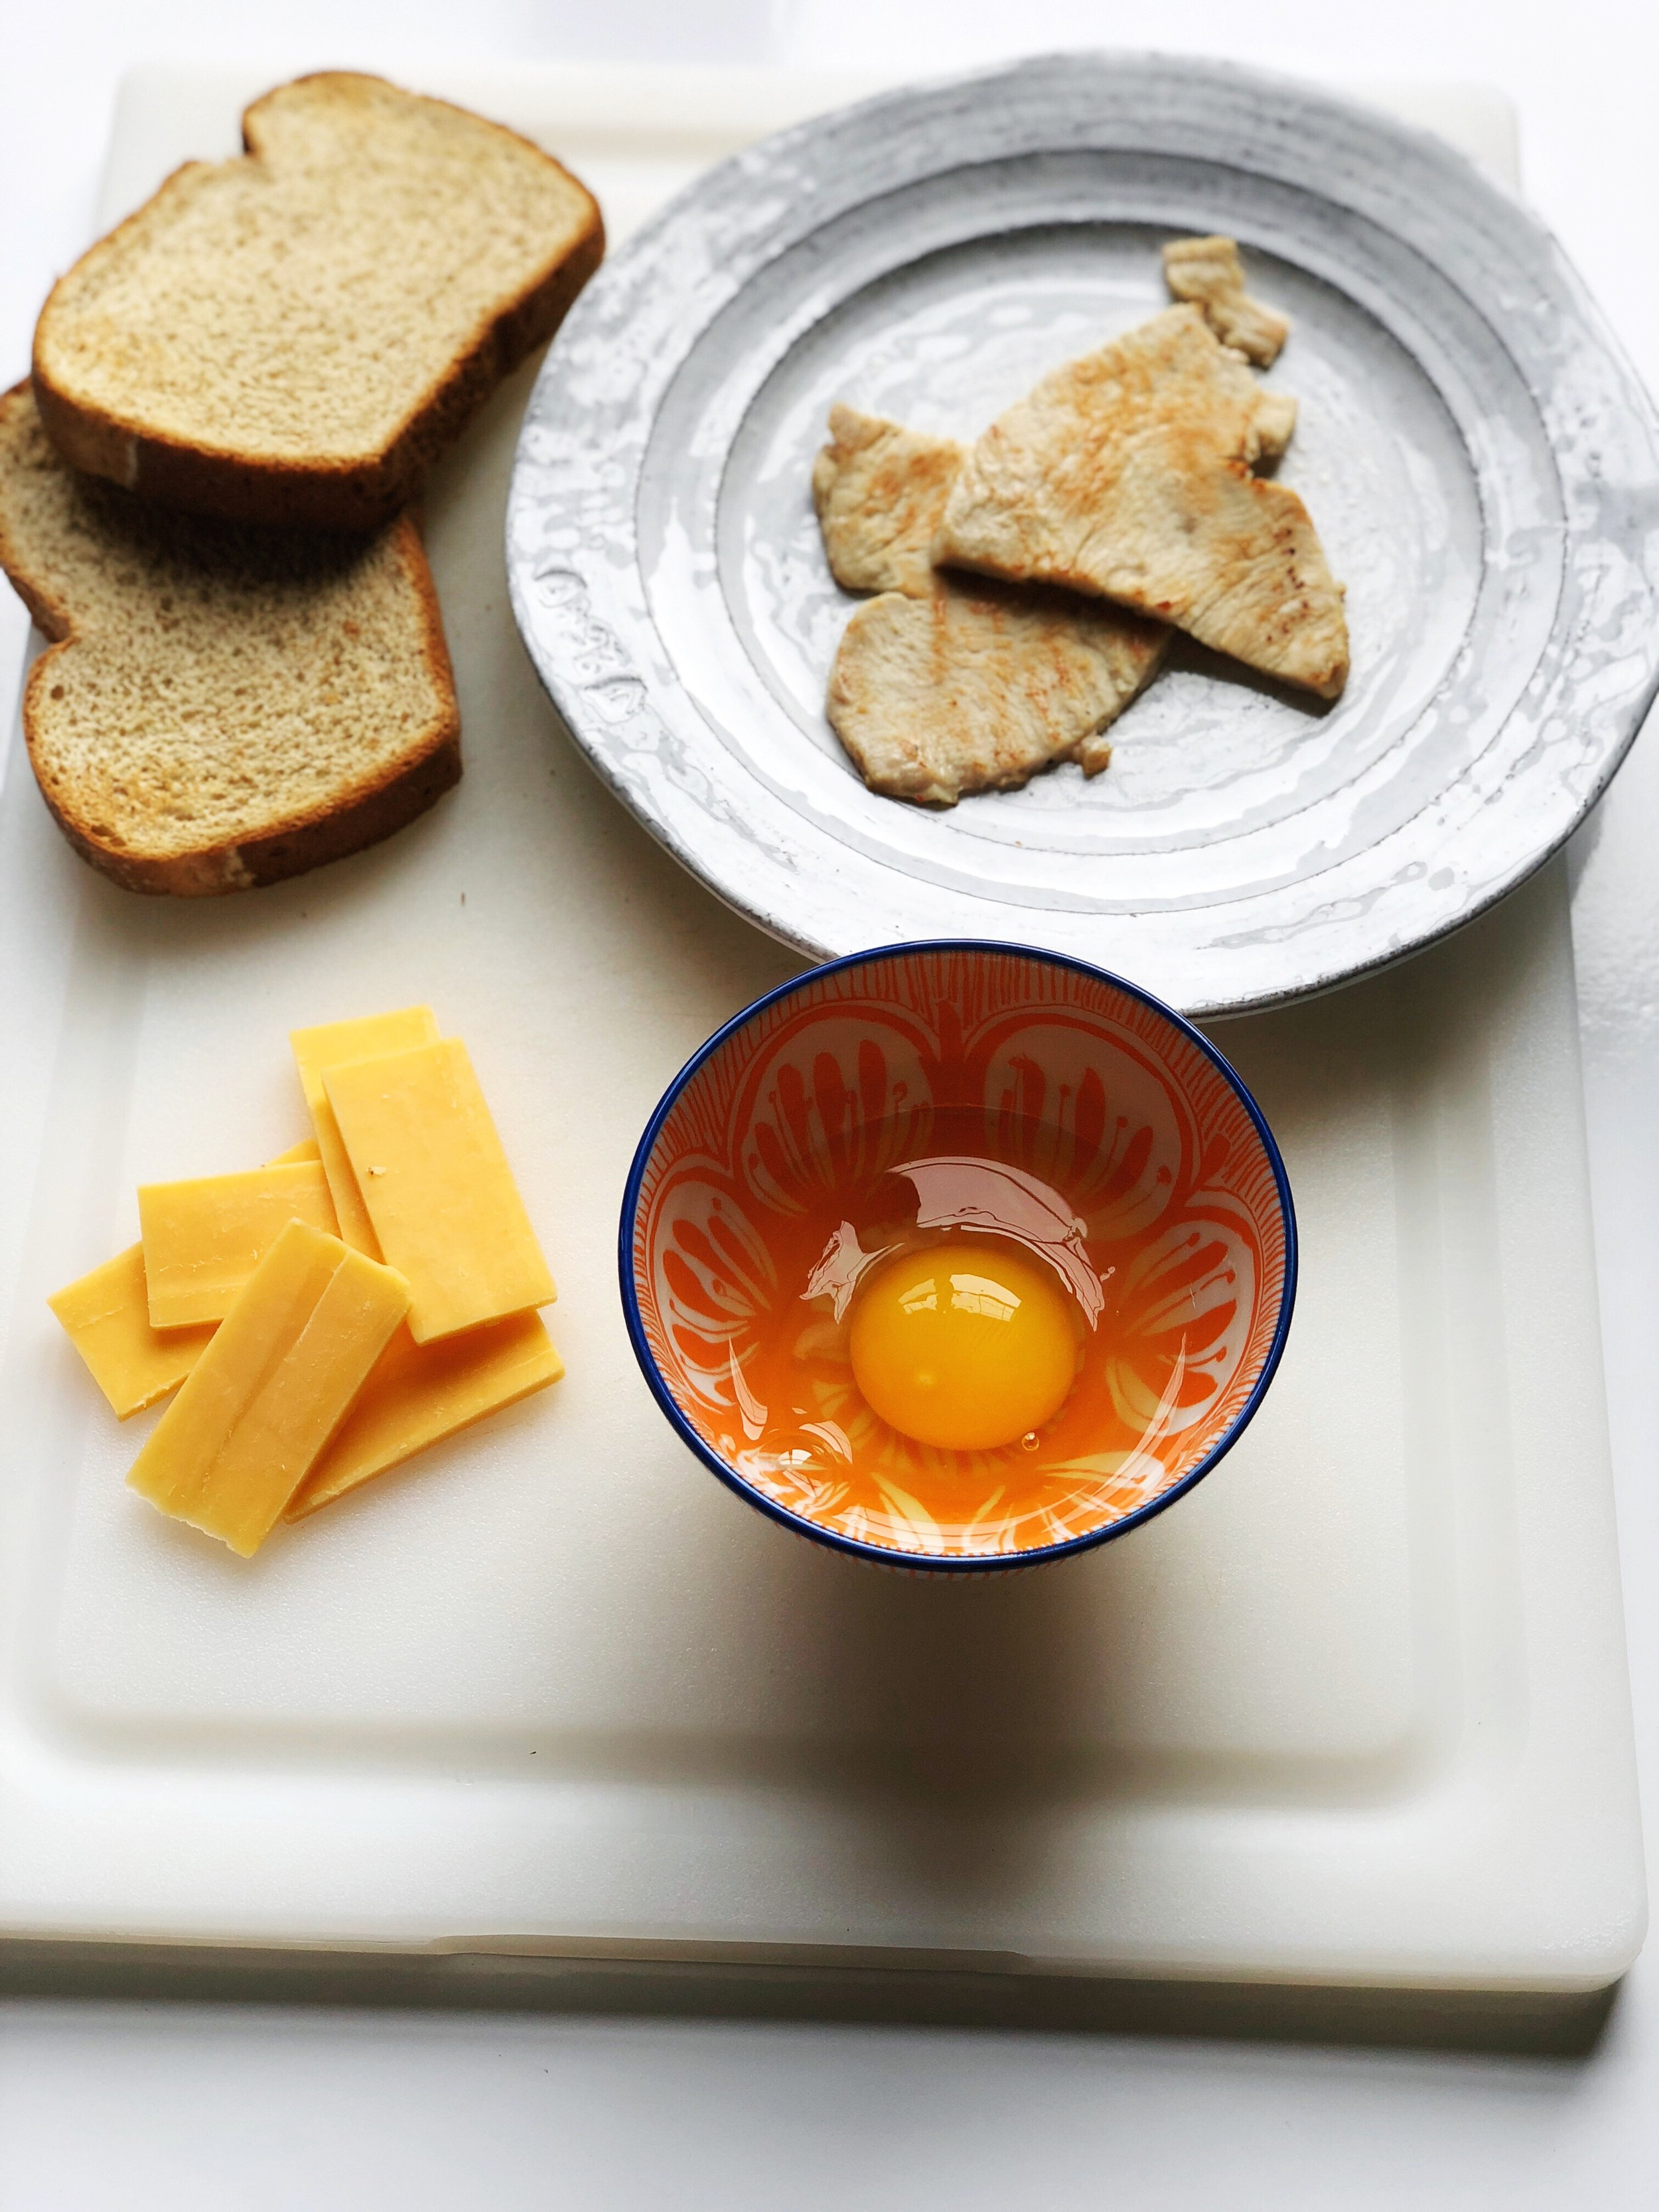 almonds and asana breakfast sandwich prep.jpg